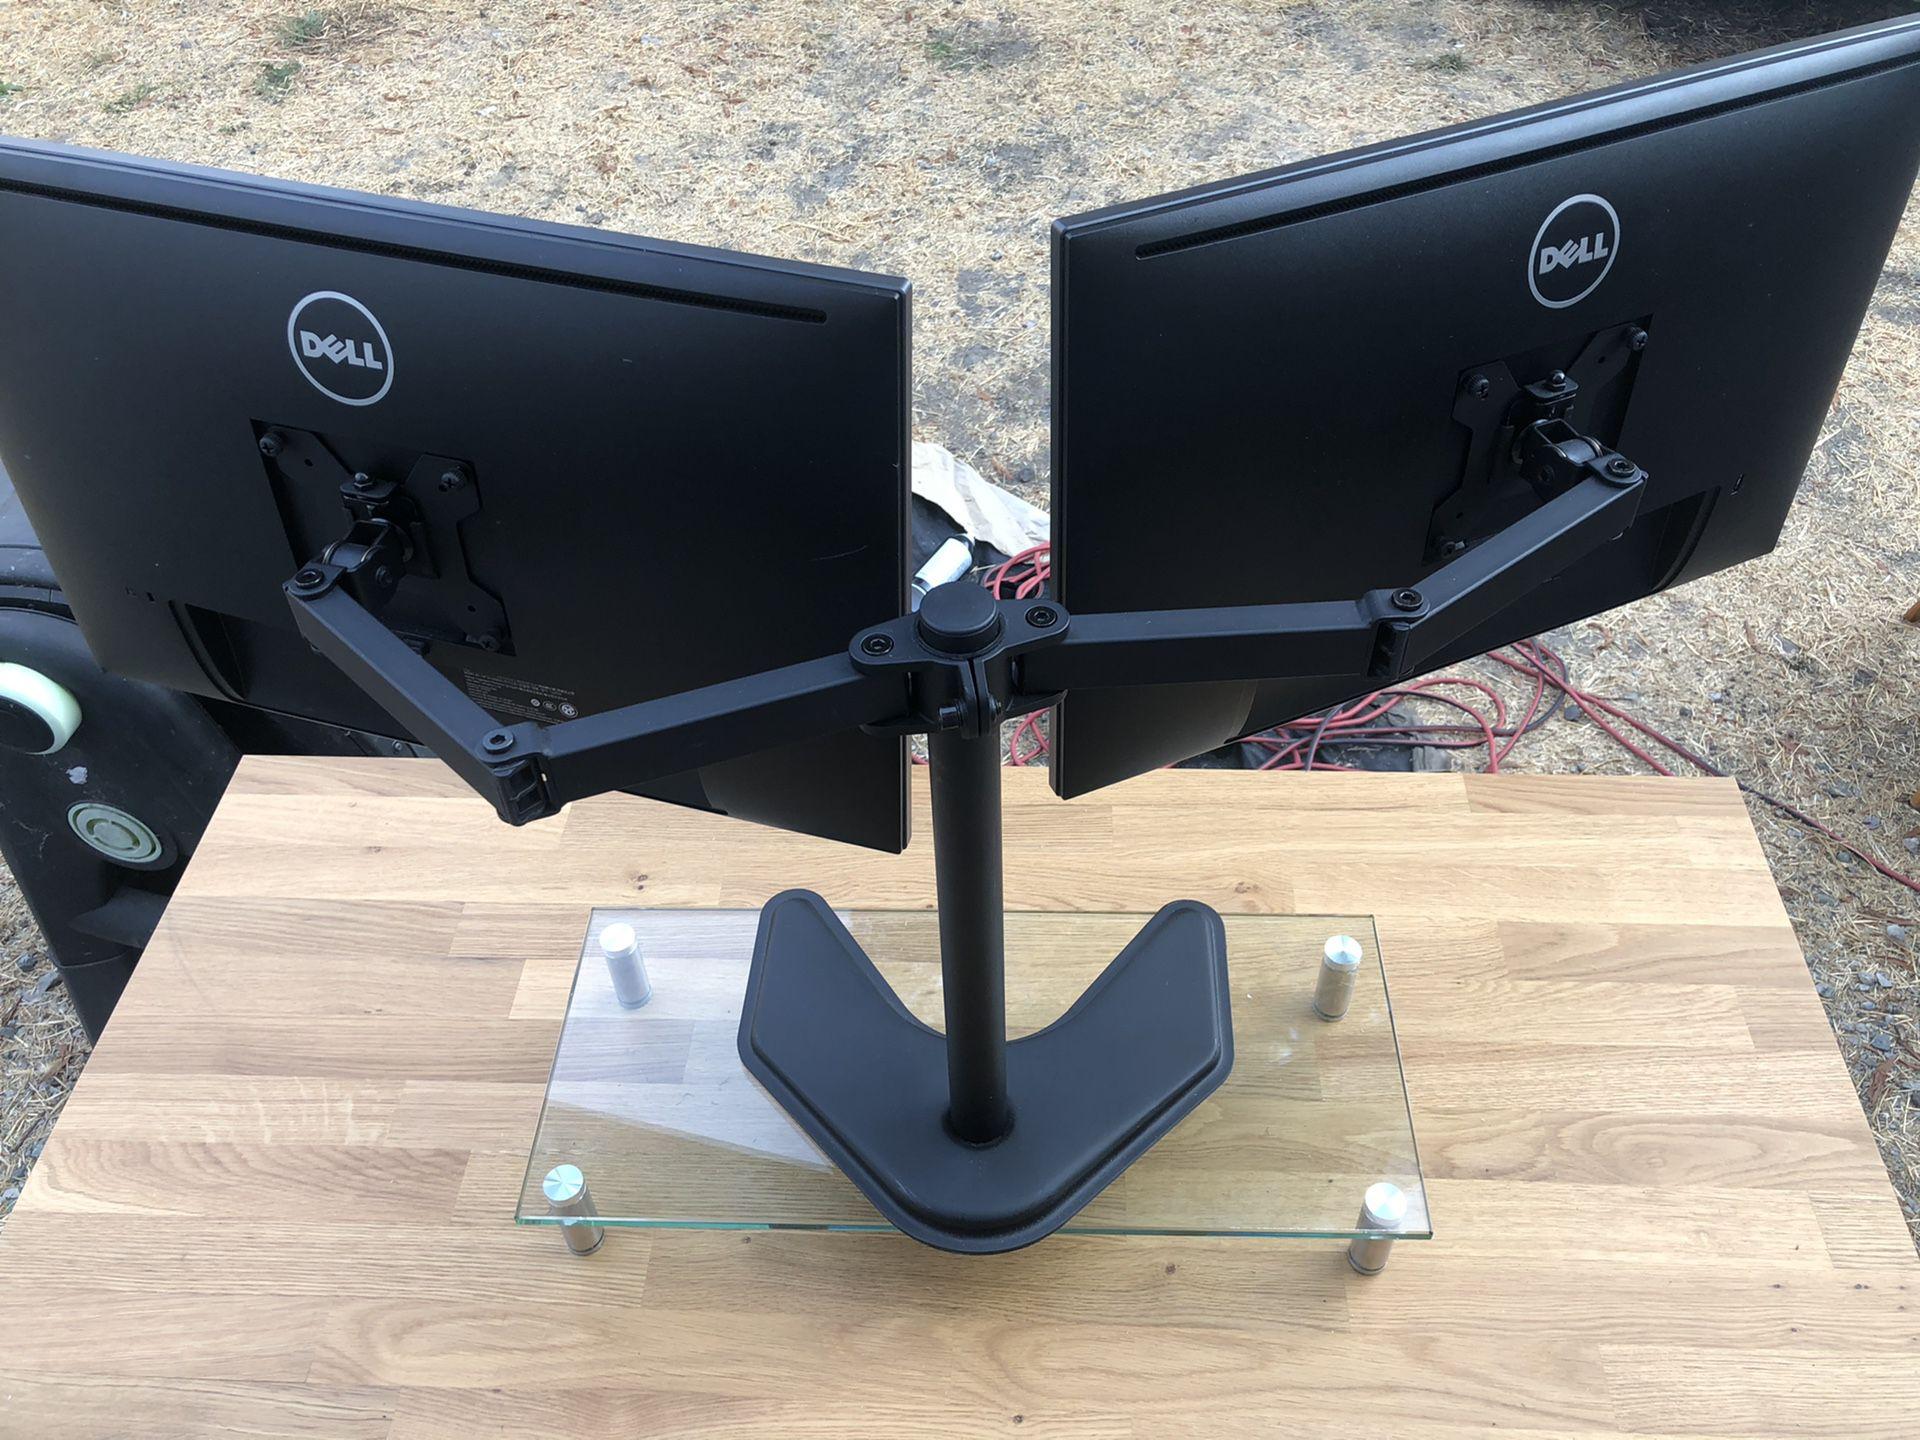 Dell UltraSharp 24 Monitor - P2419H Dual Monitor Setup